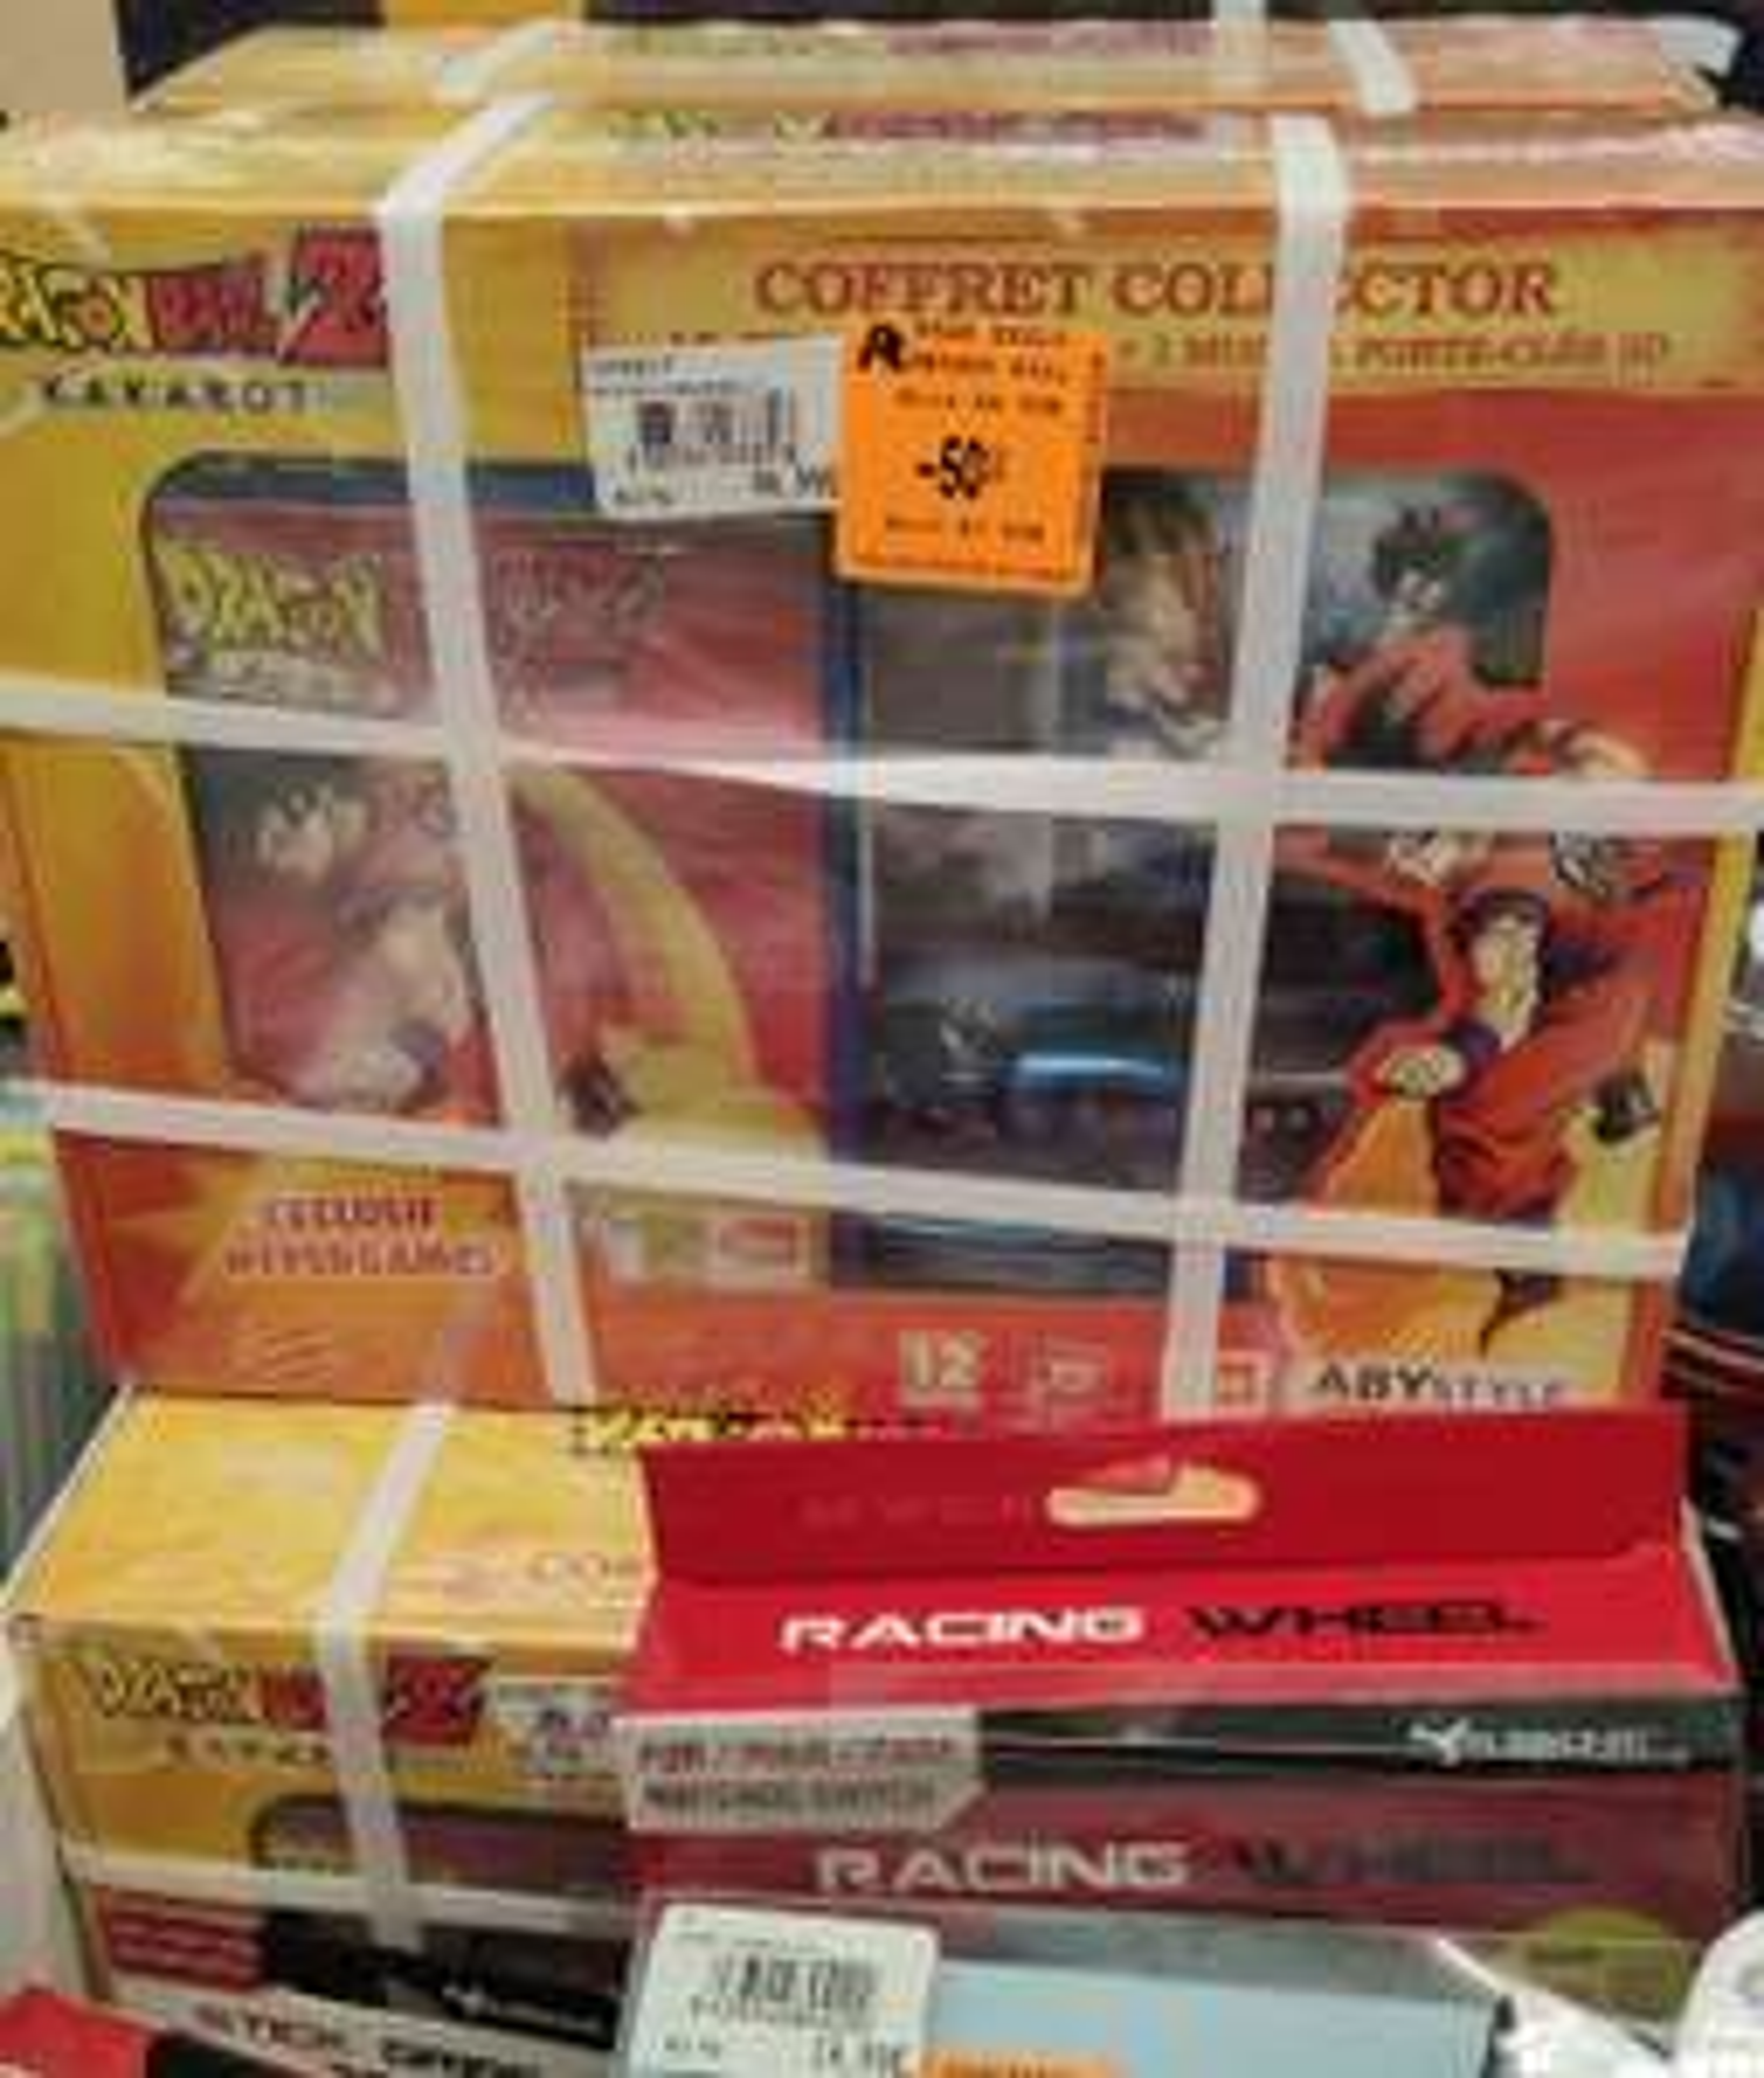 Dragon Ball Z Kakarot Coffret Collector sur PS4 - Fayet (02)